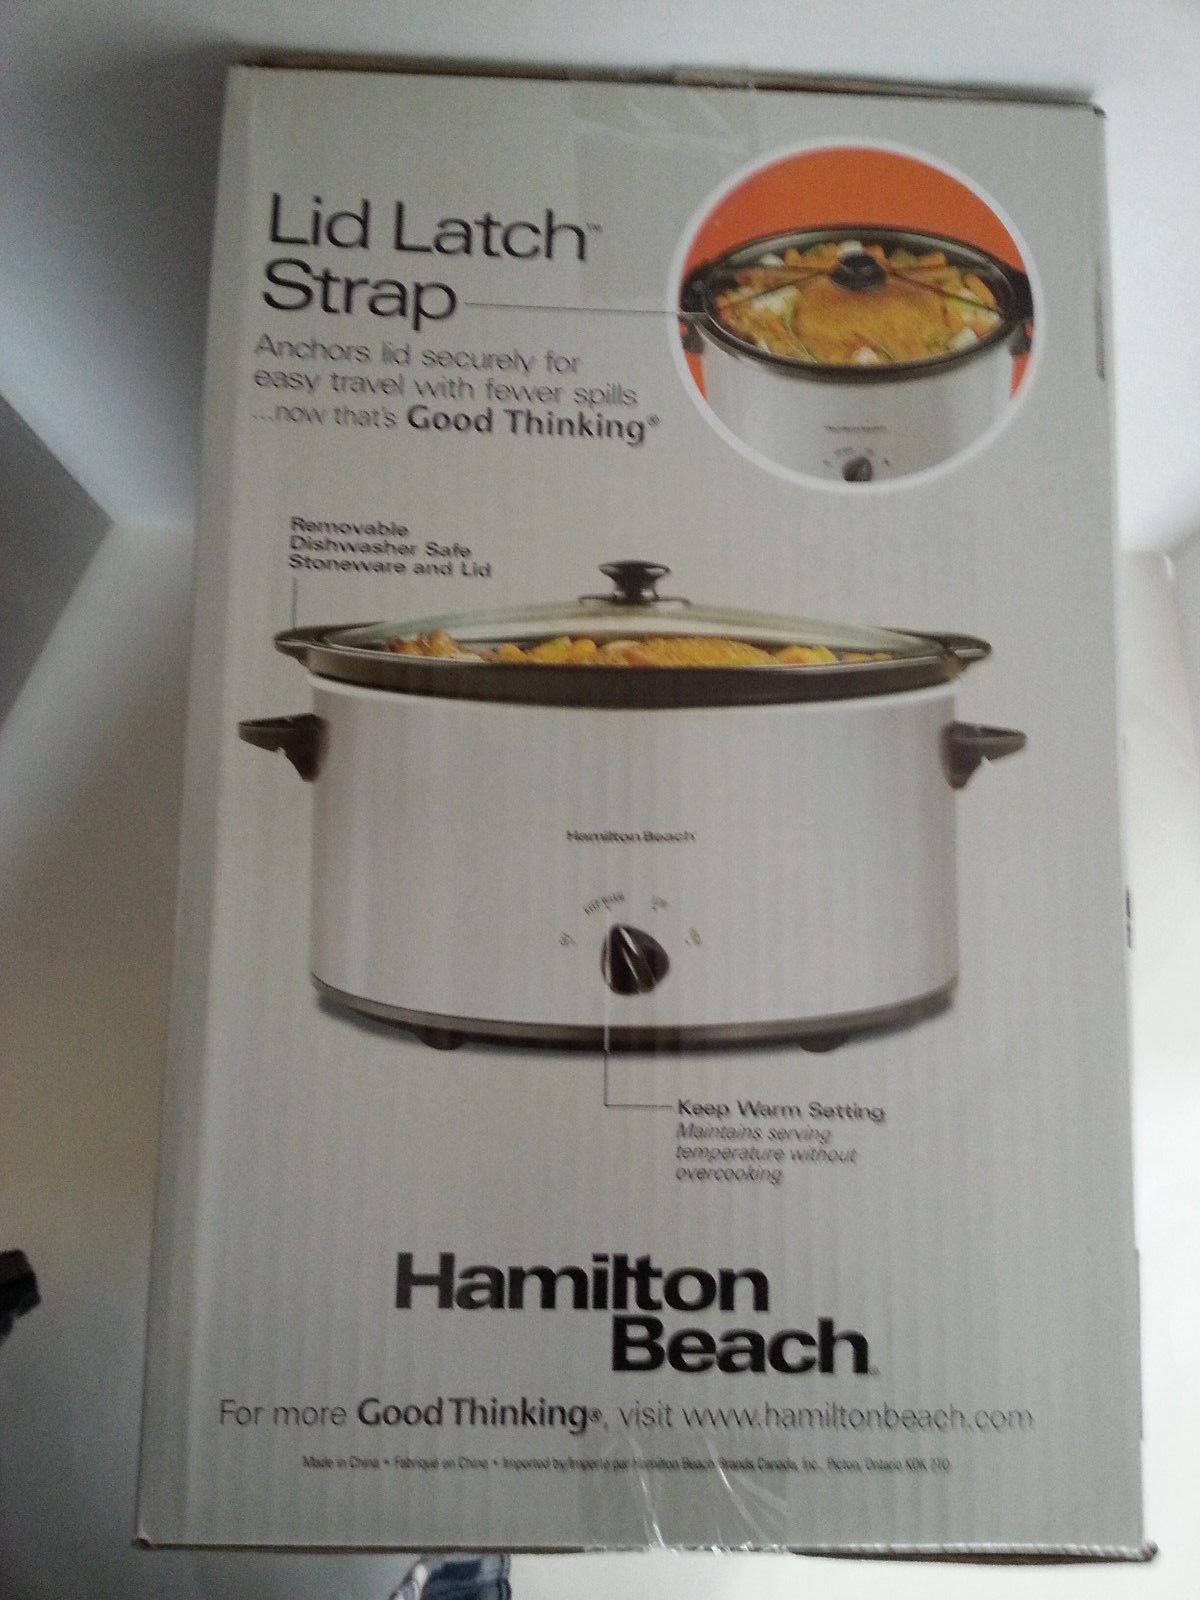 Hamilton Beach 6-qt Silver Slow Cooker #33167 Church Crock Pot One Pot Meal